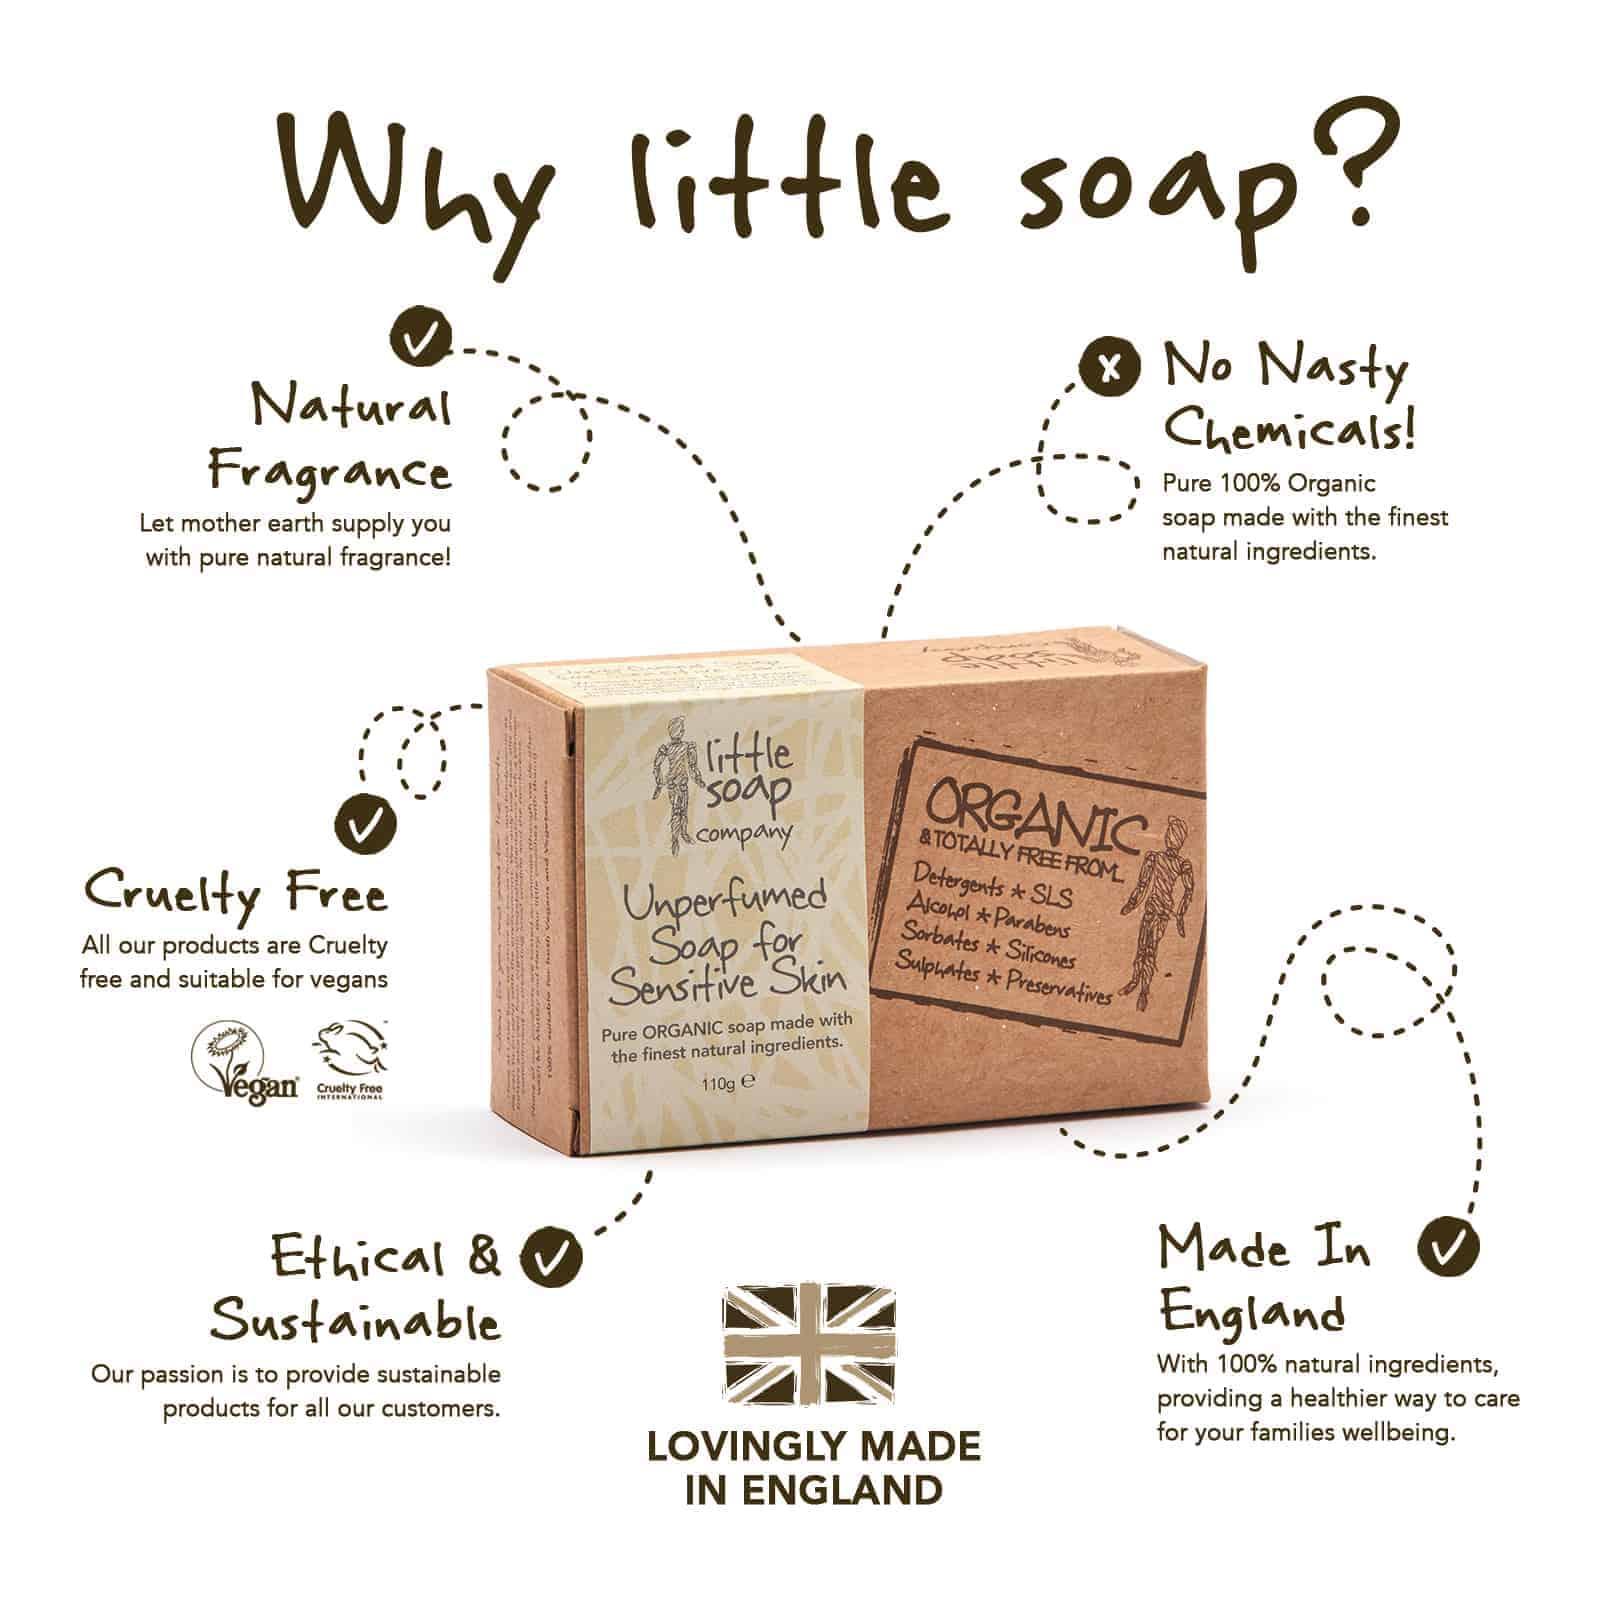 Manage Sensitive Skin from Within_LittleSoapCompany.co.uk